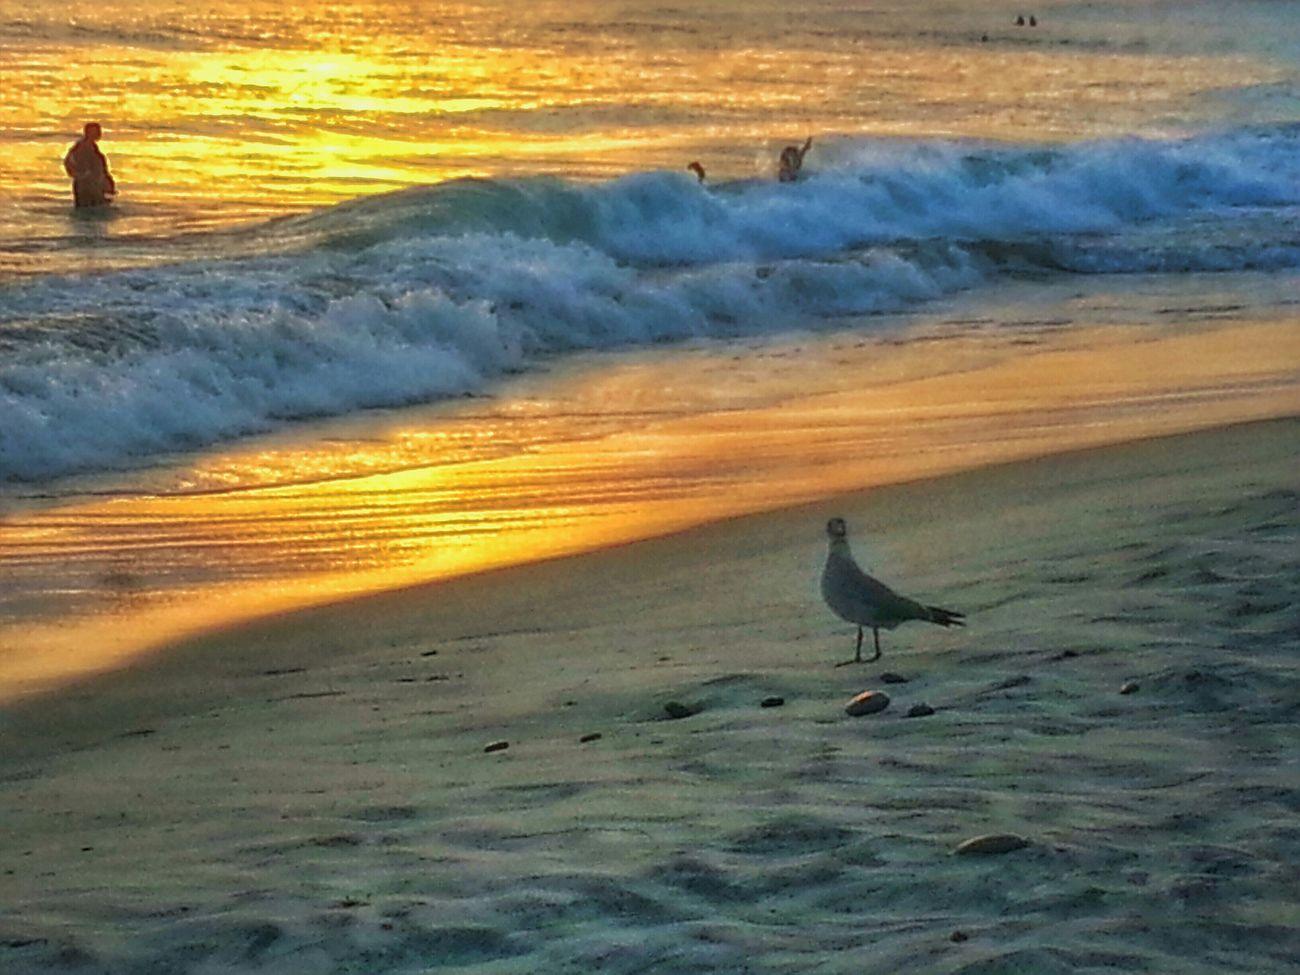 Good night ... photo taken at Oceanside California taken with Galaxynote2 Mobilephotography EyeEm Best Shots - Sunsets + Sunrise Sunset #sun #clouds #skylovers #sky #nature #beautifulinnature #naturalbeauty #photography #landscape Sunsetbeach Beach Photography Sunrise_sunsets_aroundworld